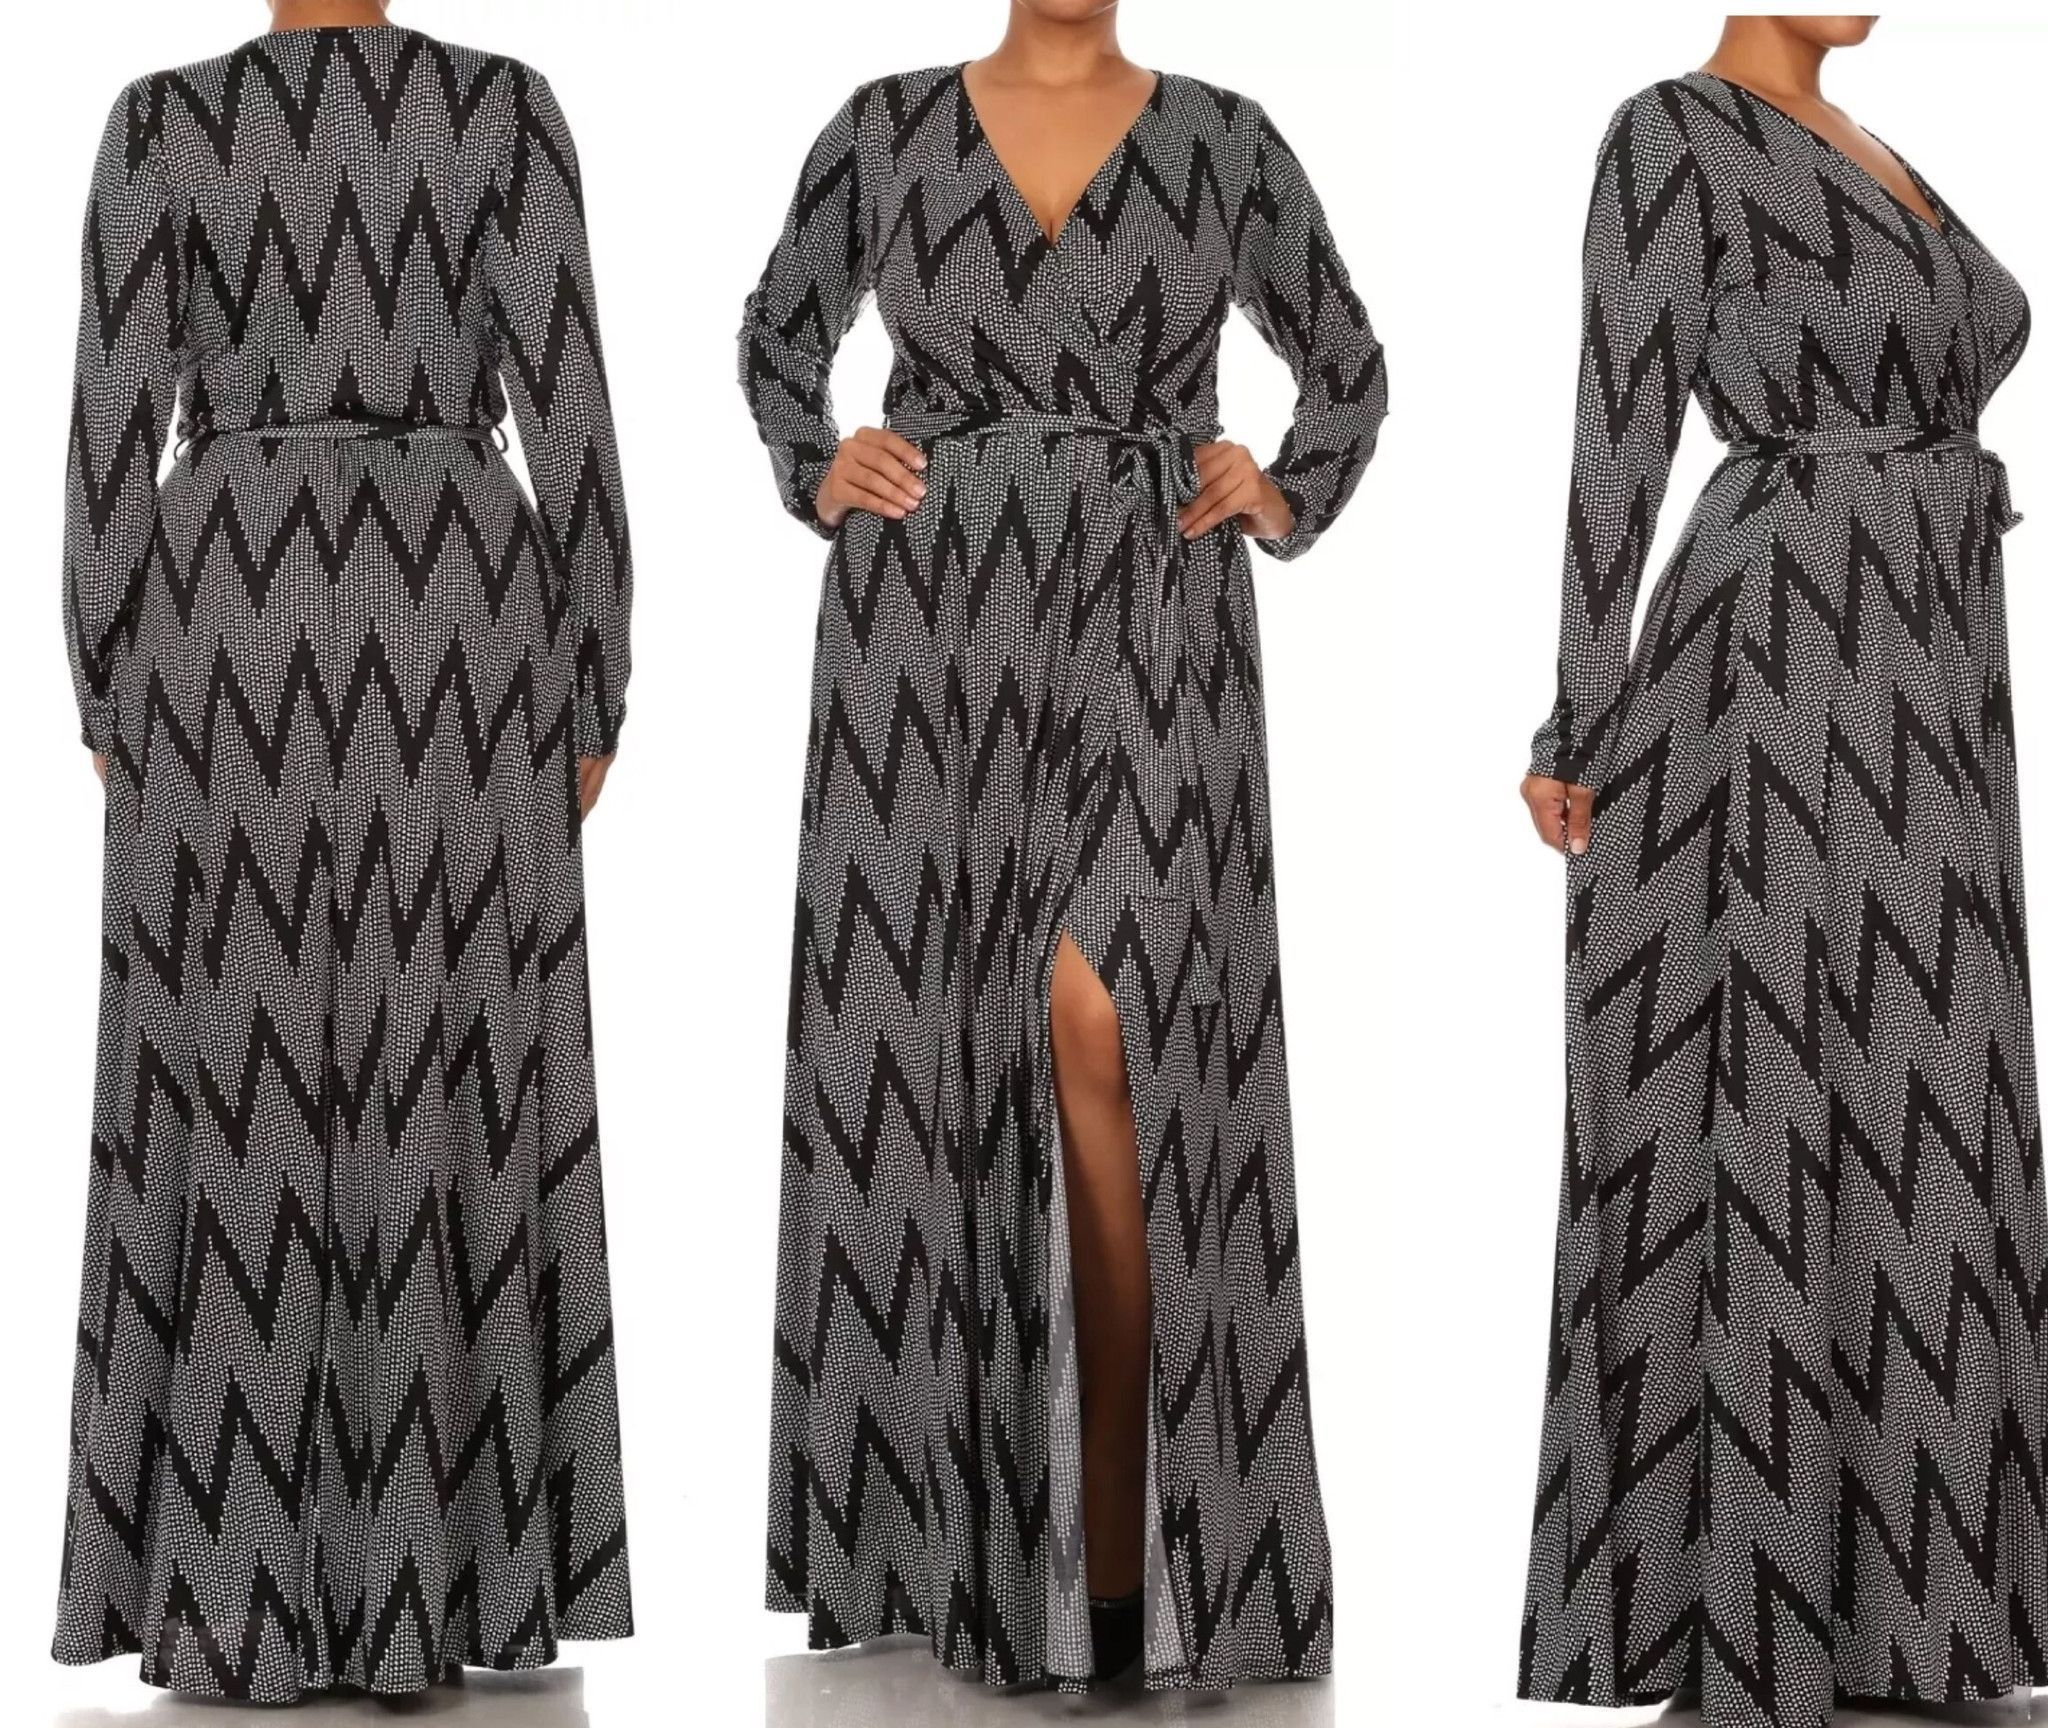 New Sexy Plus Size Black Chevron Print Wrap Dress With Open Slit Size 2XL